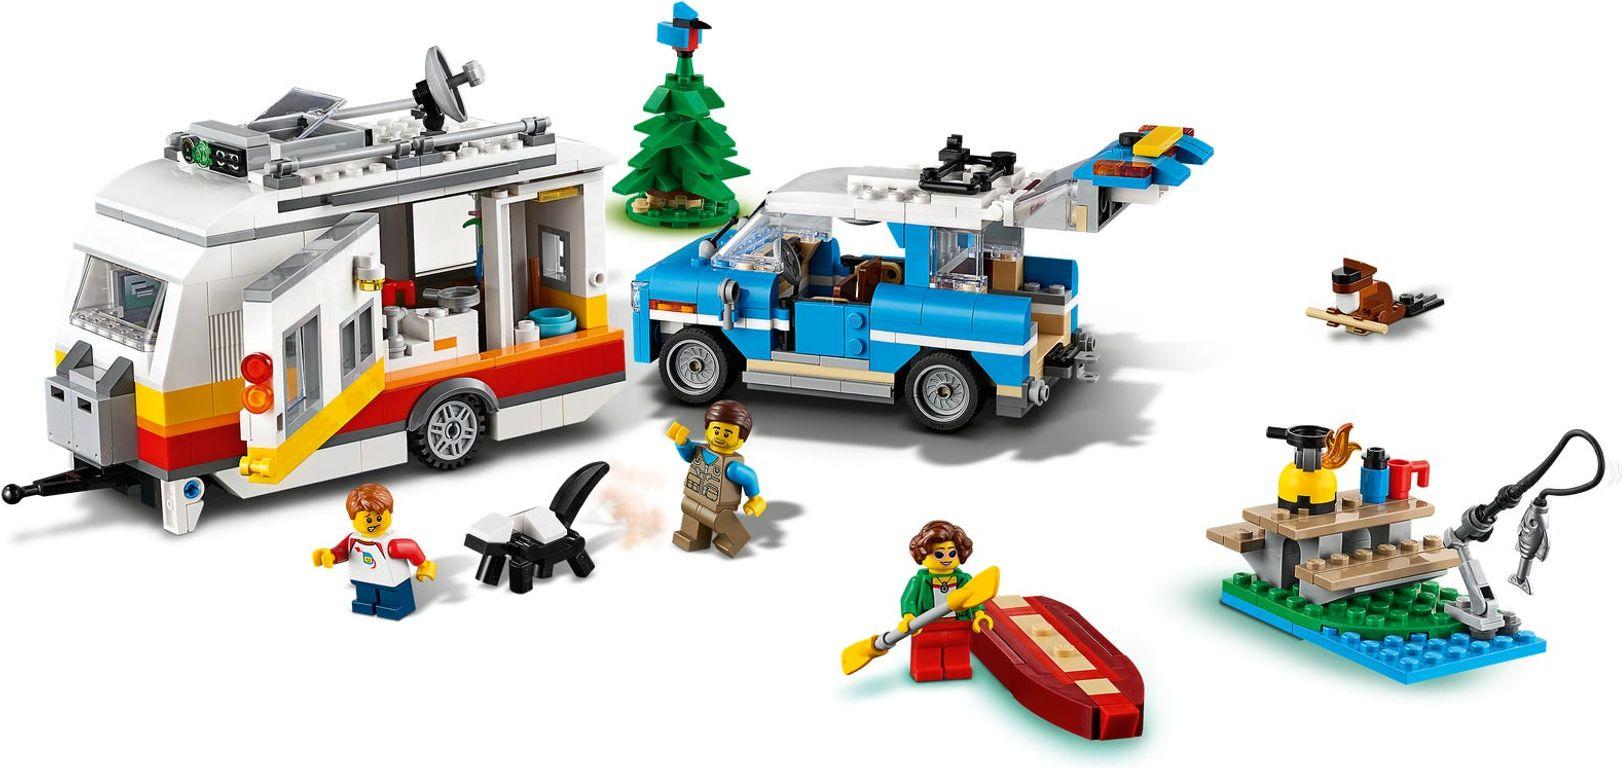 Caravan Family Holiday gameplay